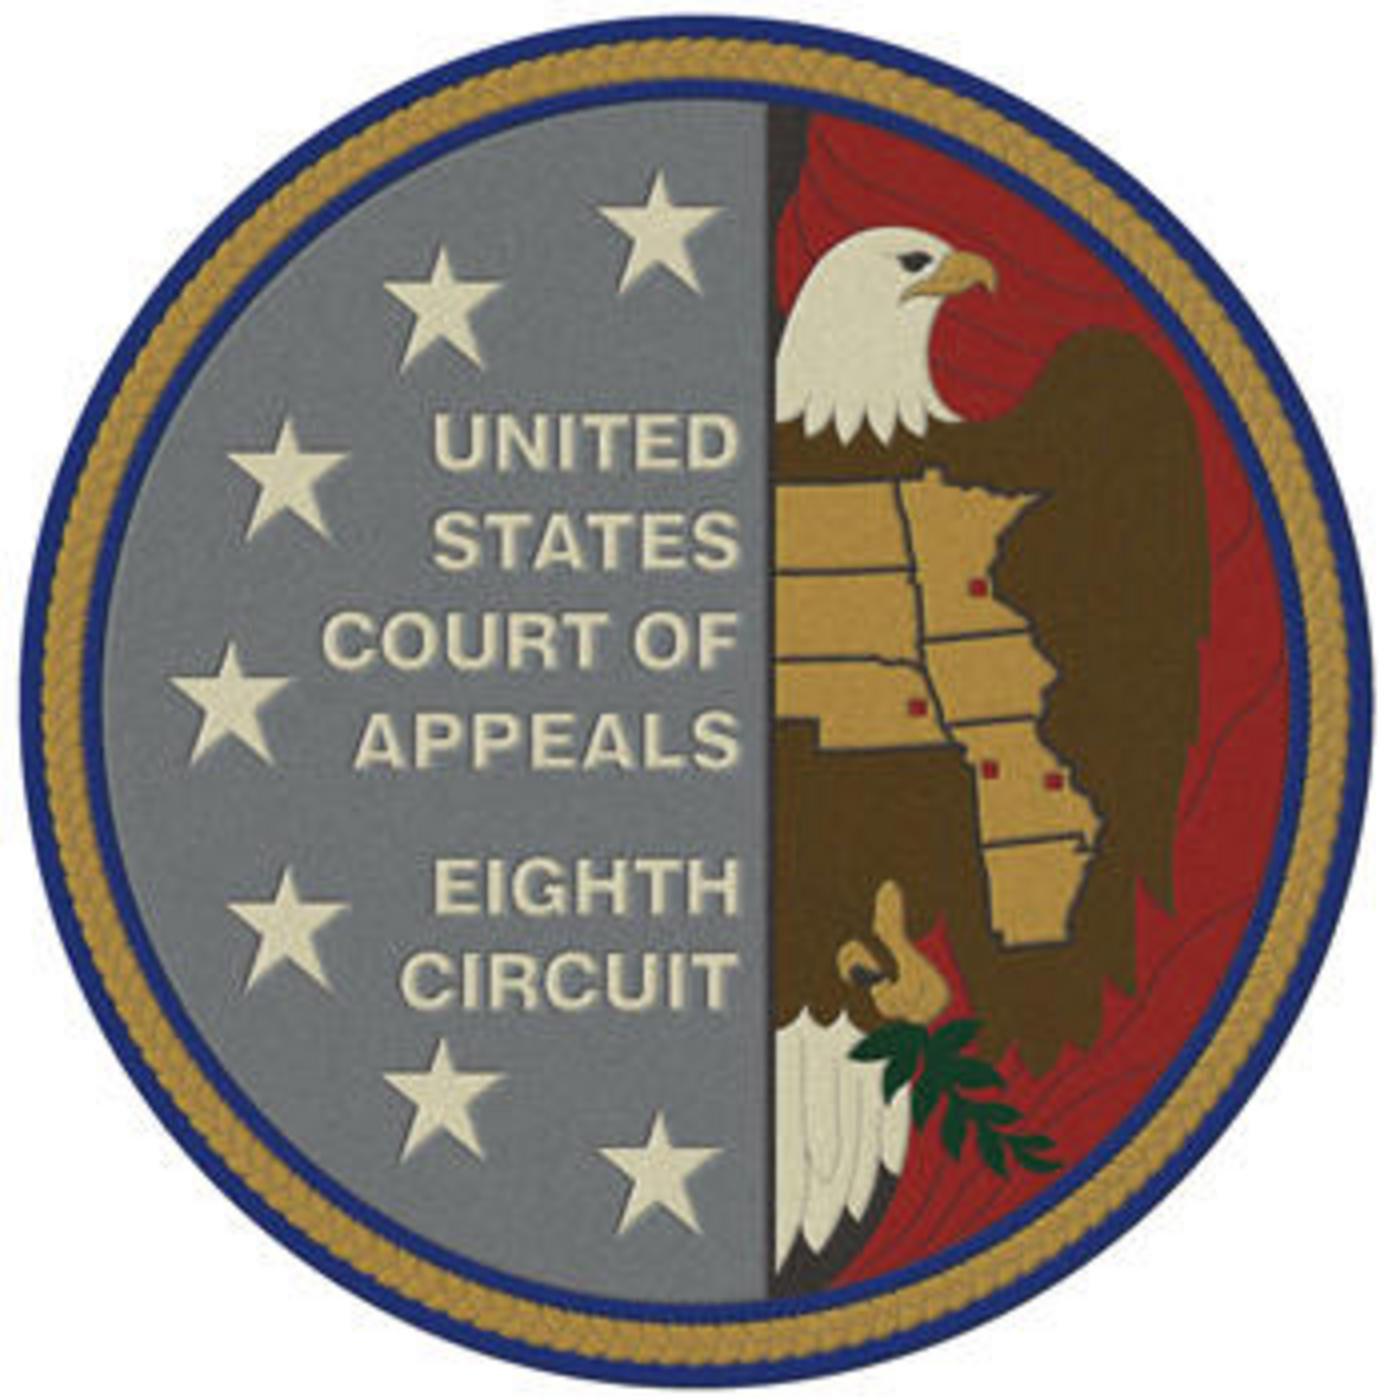 19-3189: Mayo Clinic vs United States